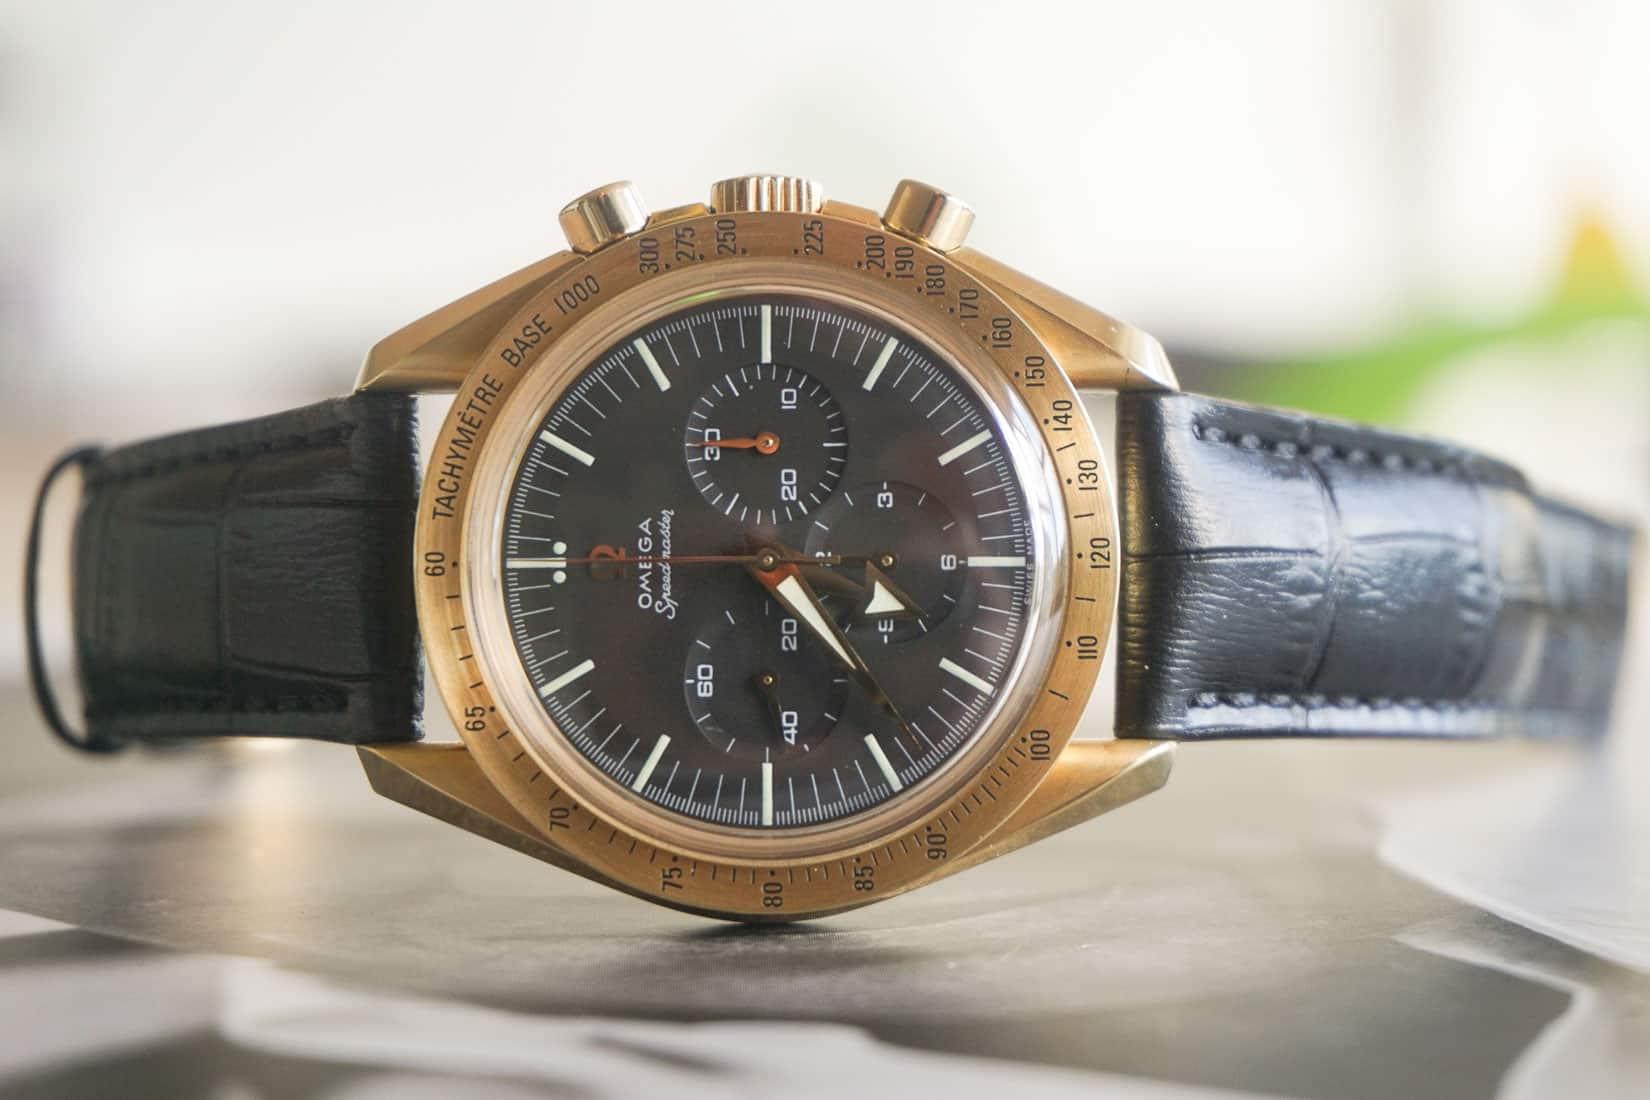 Speedy Tuesday – A Very Rare Omega Speedmaster '150th Anniversary of Omega'